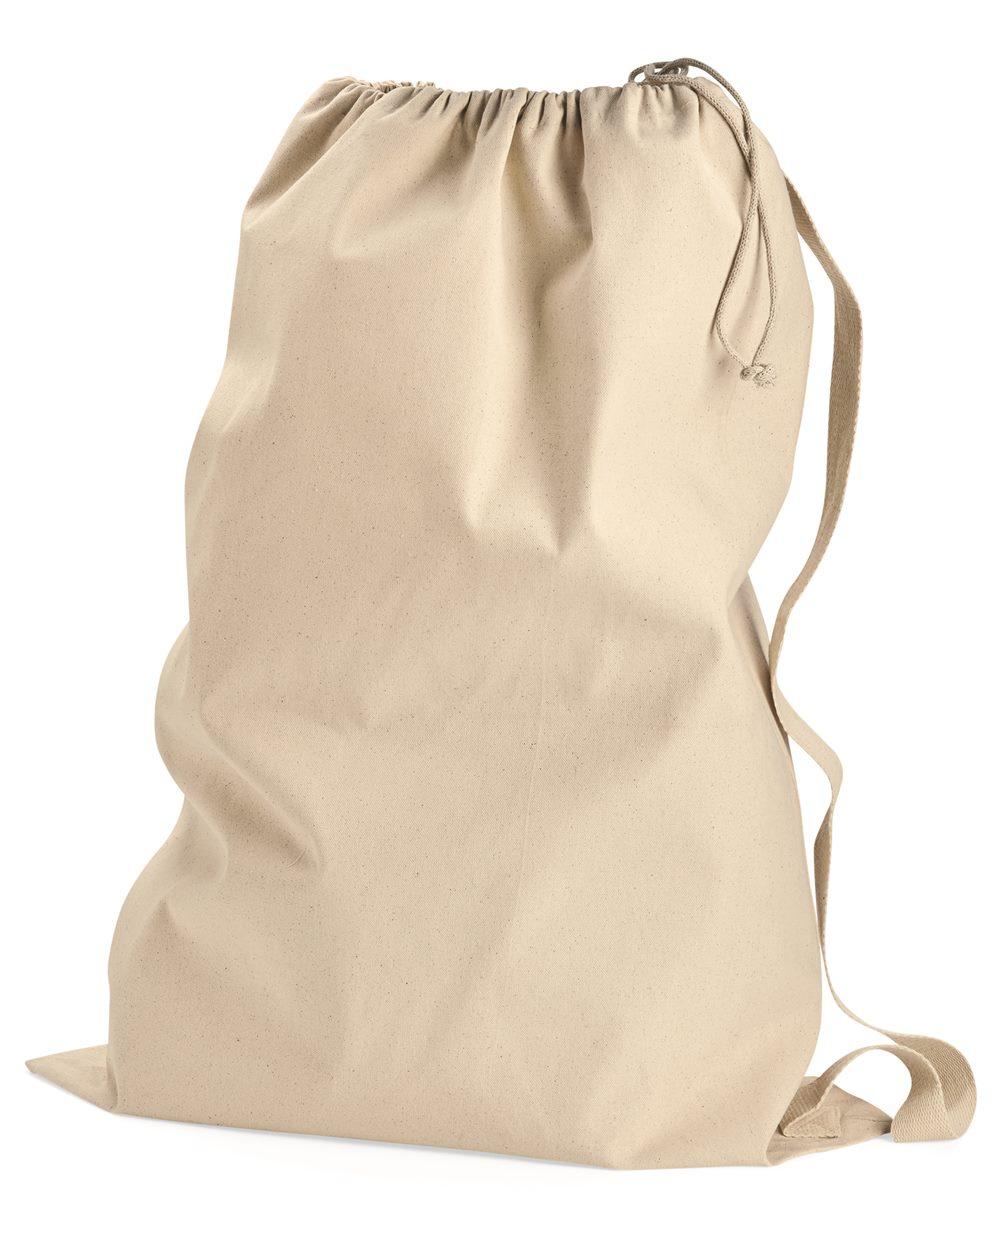 283b6c4e96e Nike Sport Laundry Bags - from  1.38